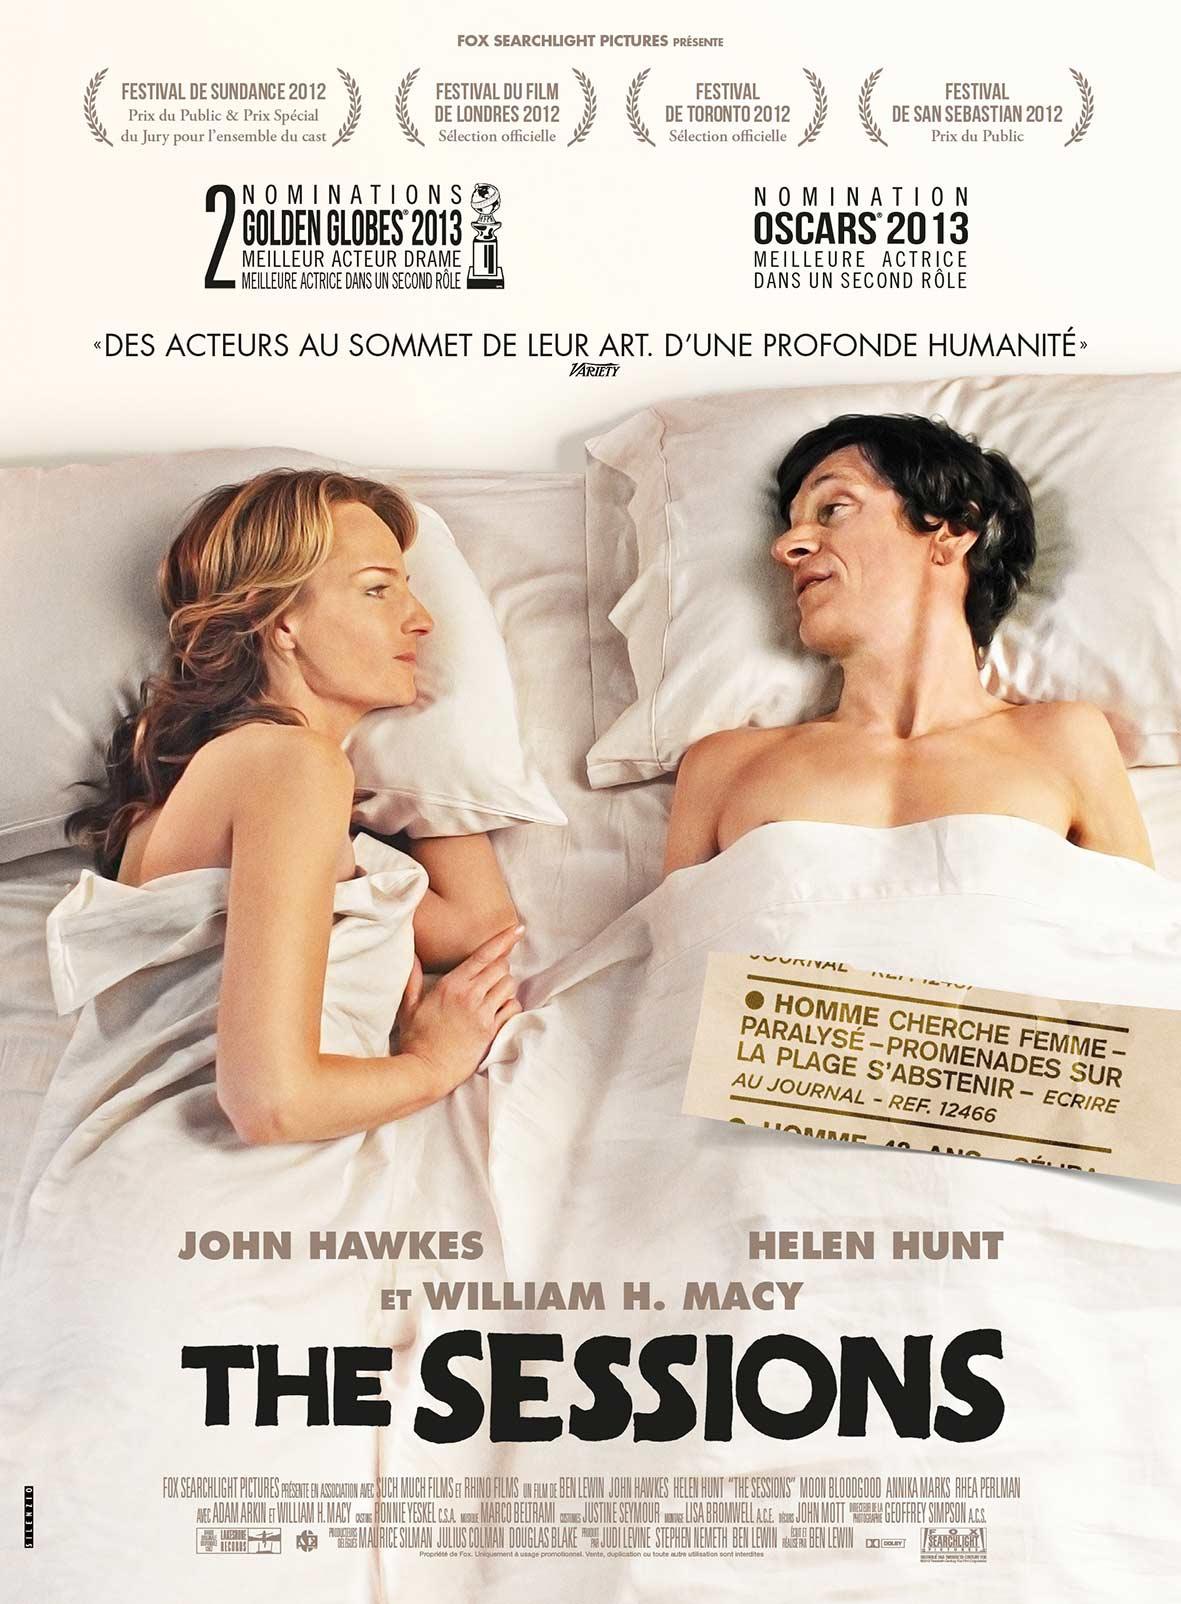 Affiche du film The Sessions.